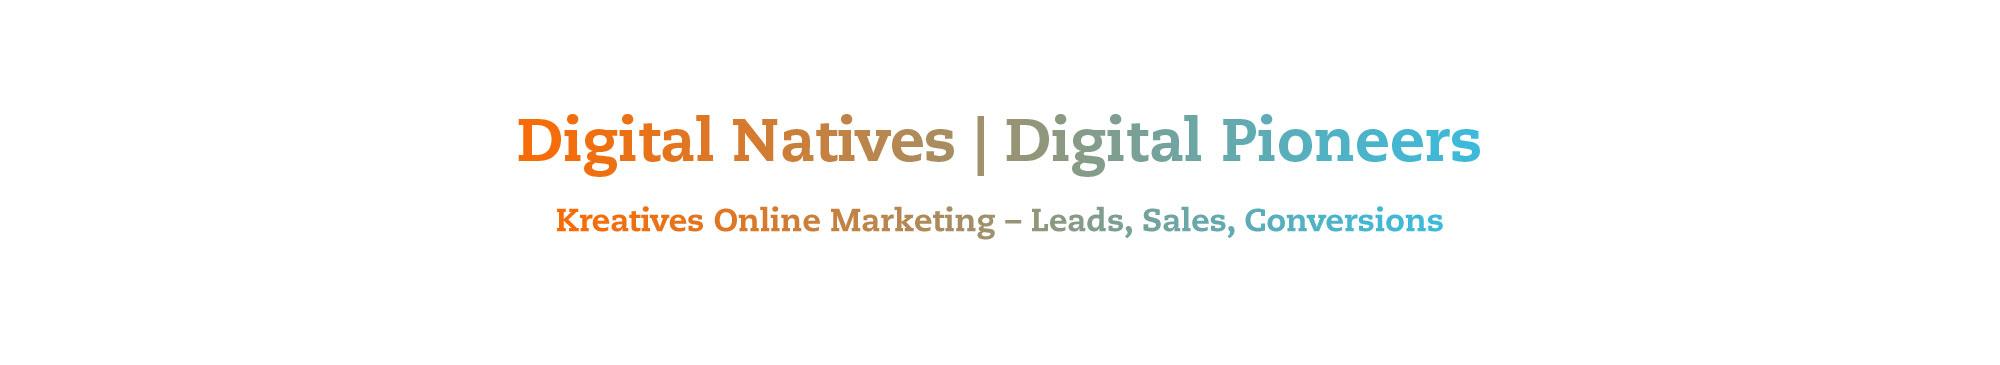 R&R/COM Digital Natives Digital Pioneers Kreatives Online Marketing Leads, Sales, Conversions